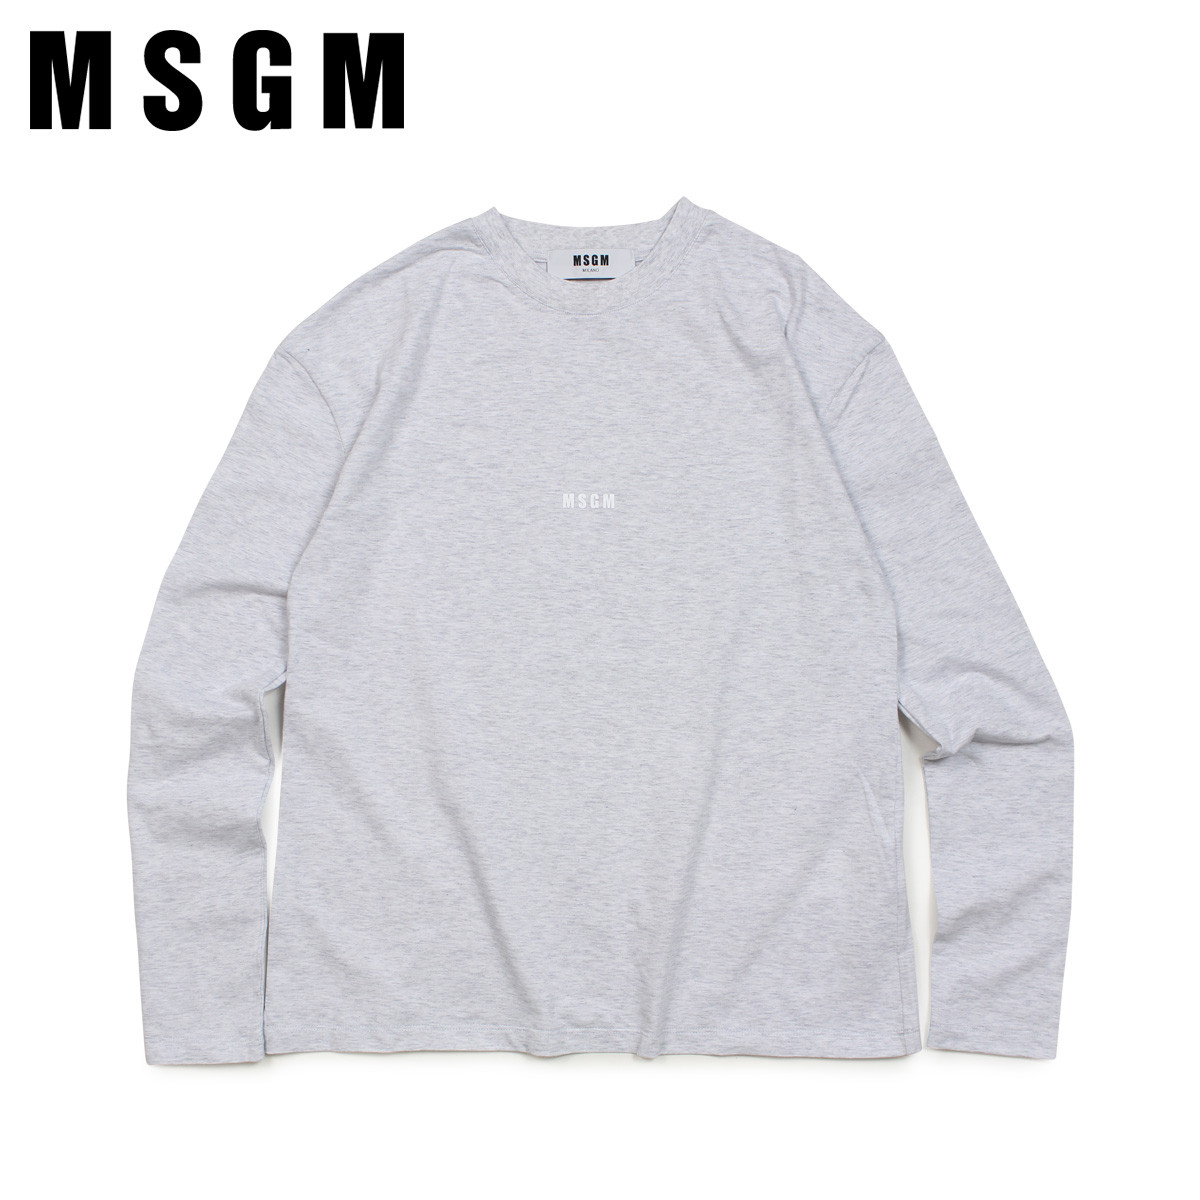 MSGM LOGO LONG SLEEVED SHIRTS WITH MICRO LOGO エムエスジーエム Tシャツ 長袖 レディース ロンT グレー MDM101 94